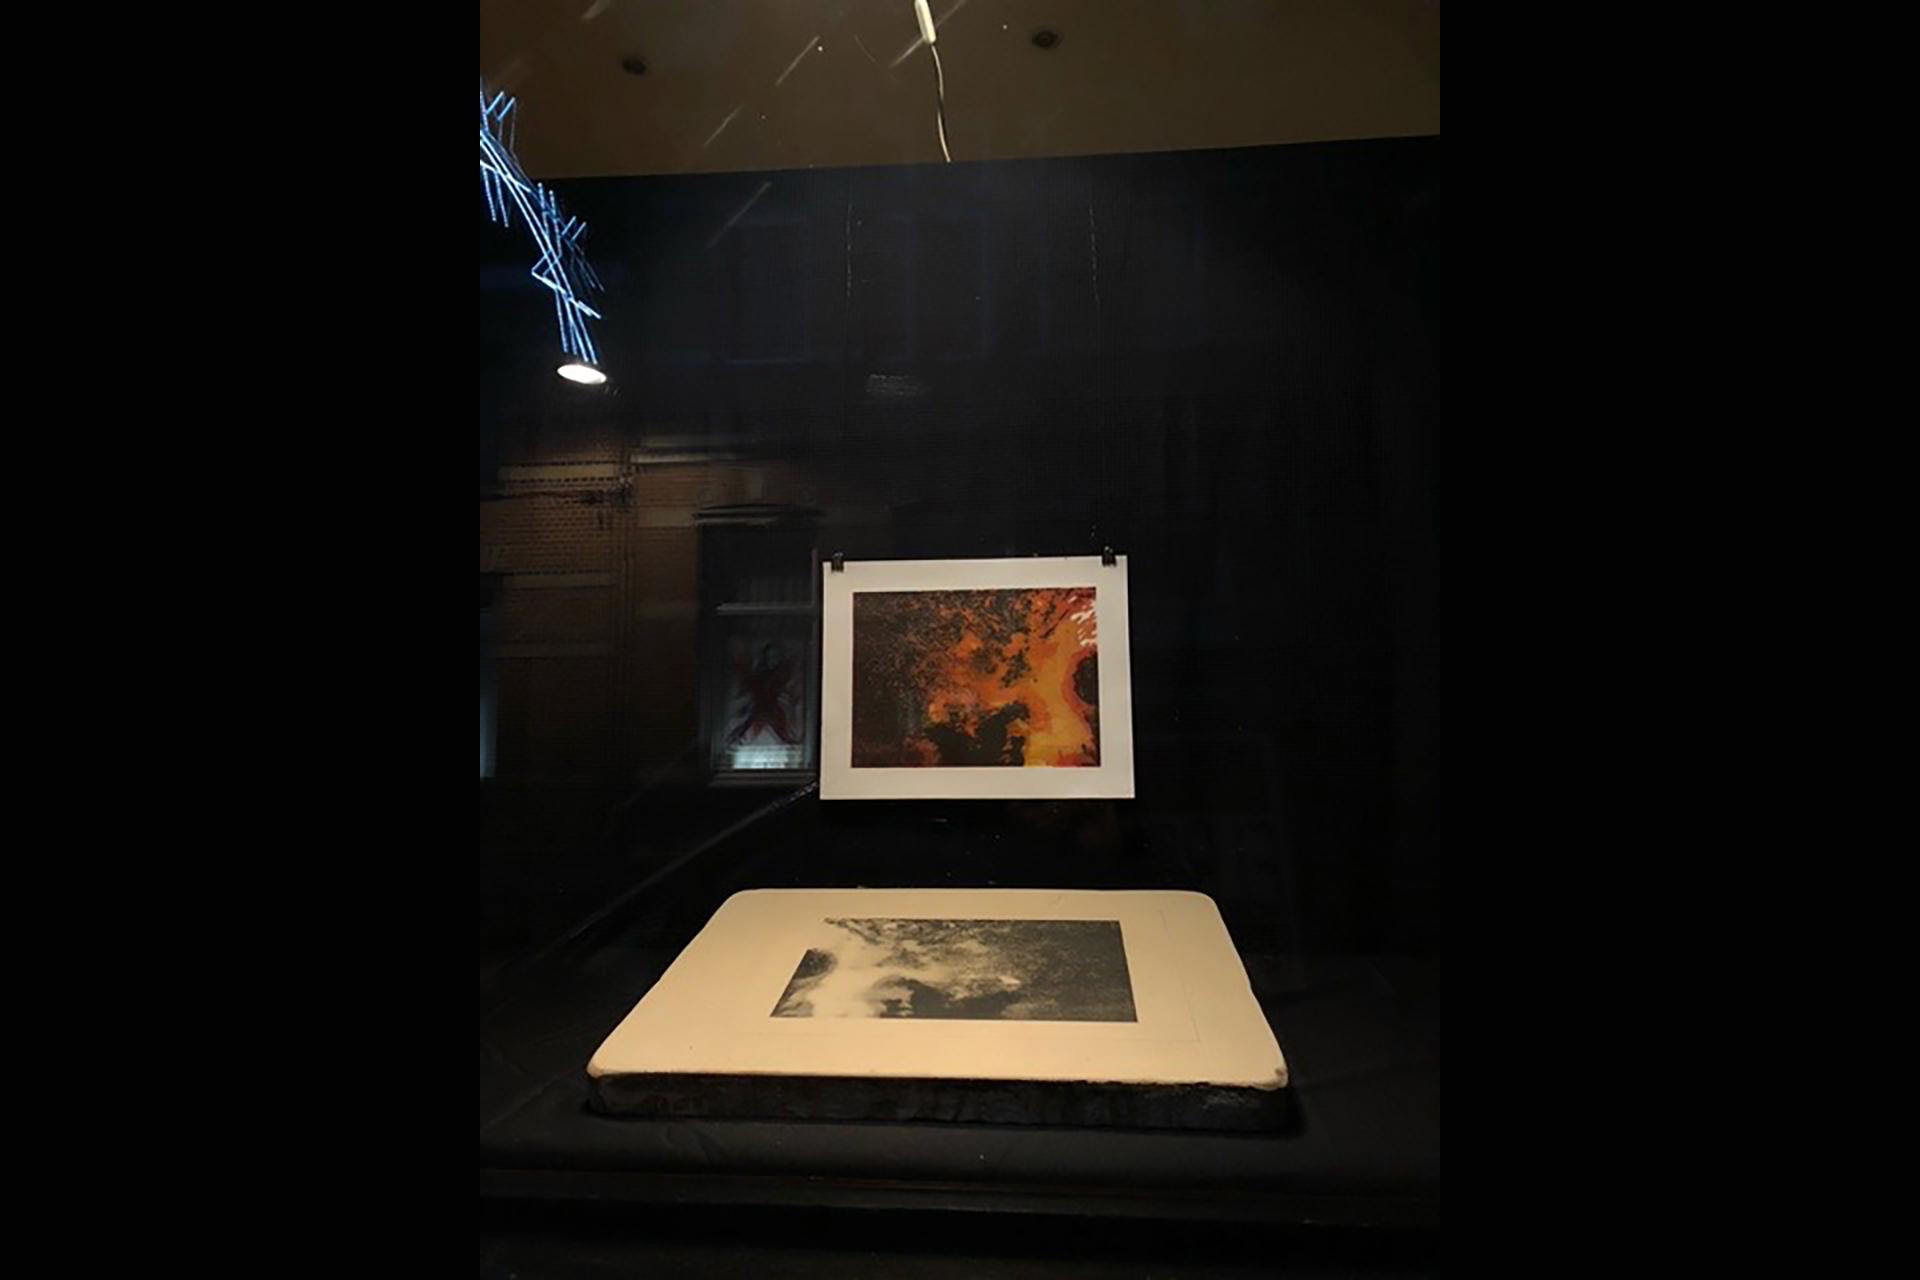 Vuursteen, litho en steen op de tentoonstelling 'Achter Glas' (foto G. Pille)